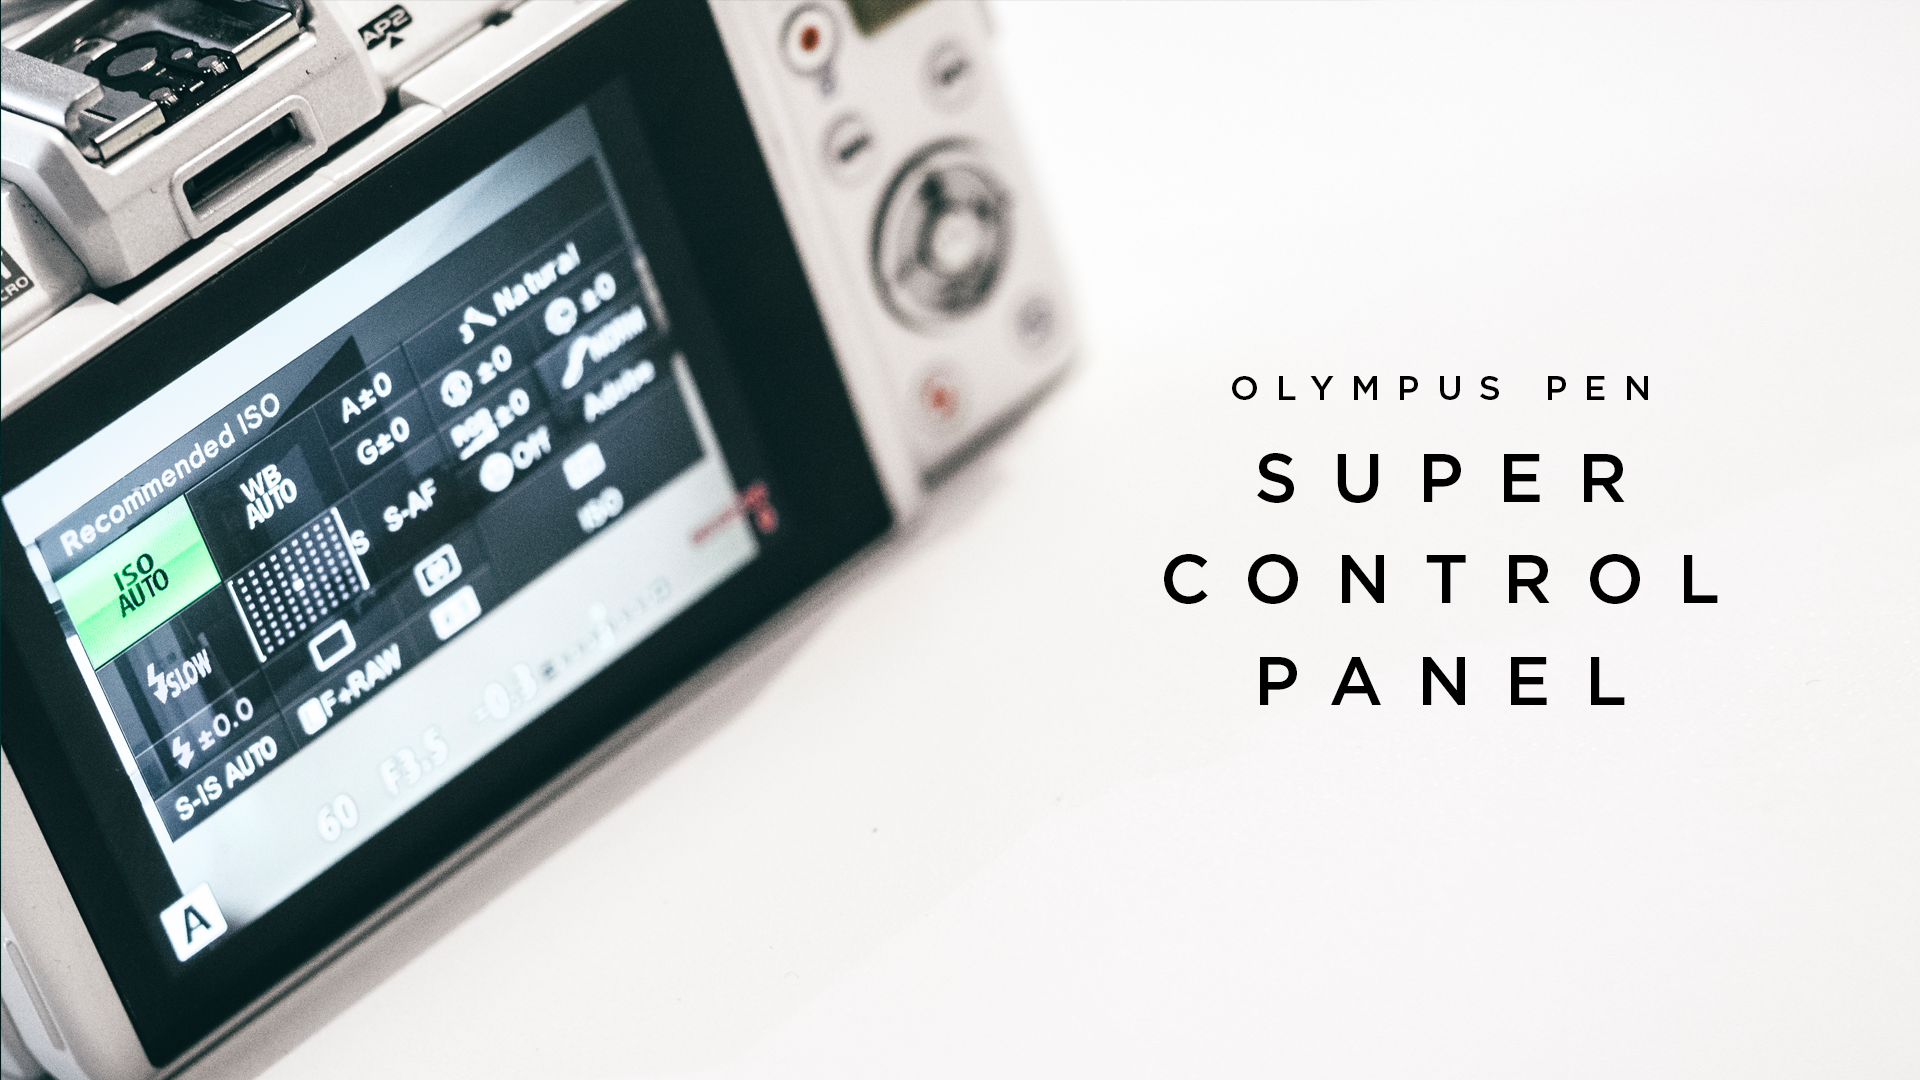 Olympus PEN Super Control Panel Live SCP camera settings